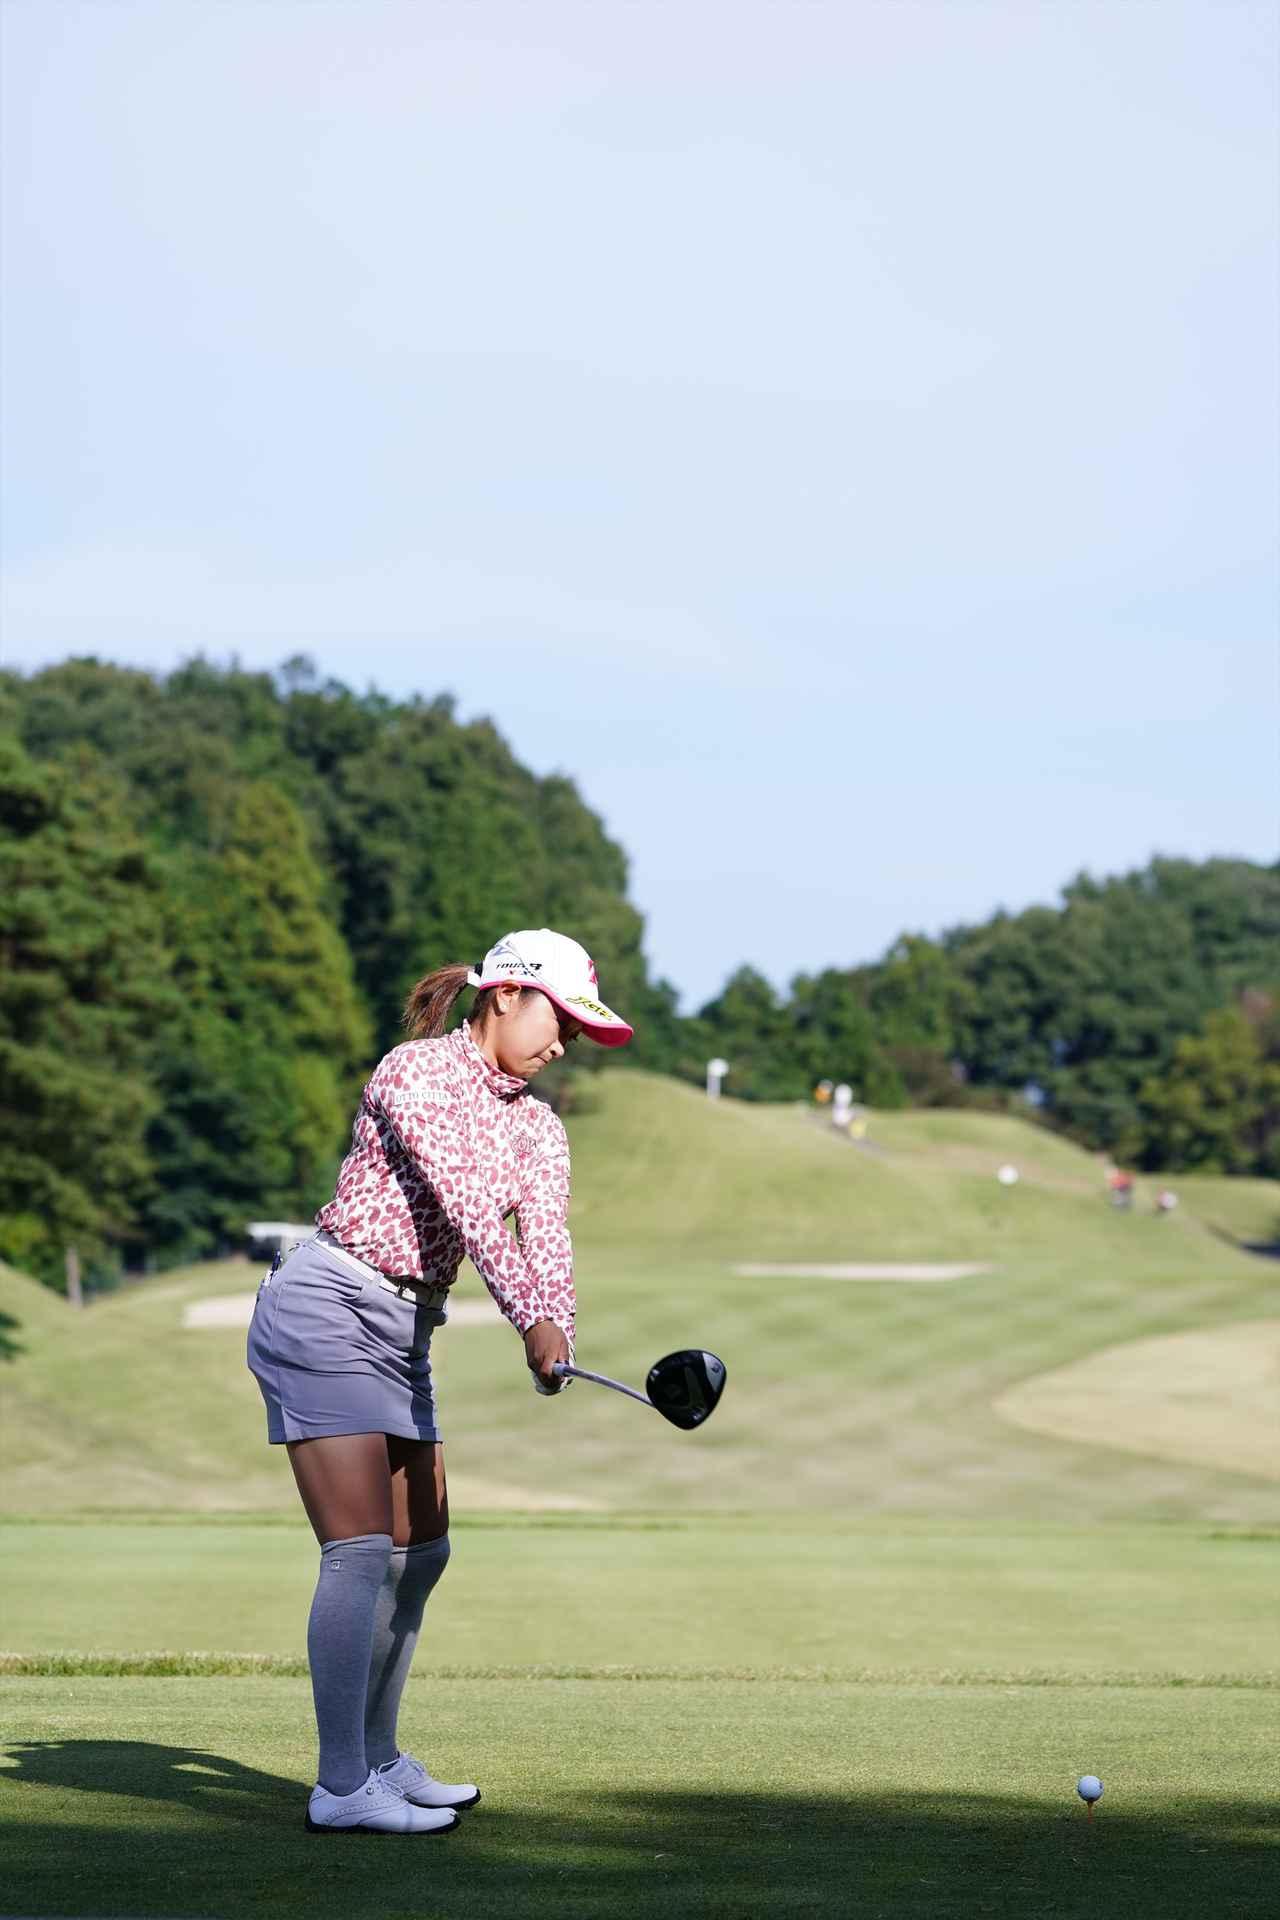 Images : 2番目の画像 - 高木優奈 ドライバー後方連続写真 - みんなのゴルフダイジェスト